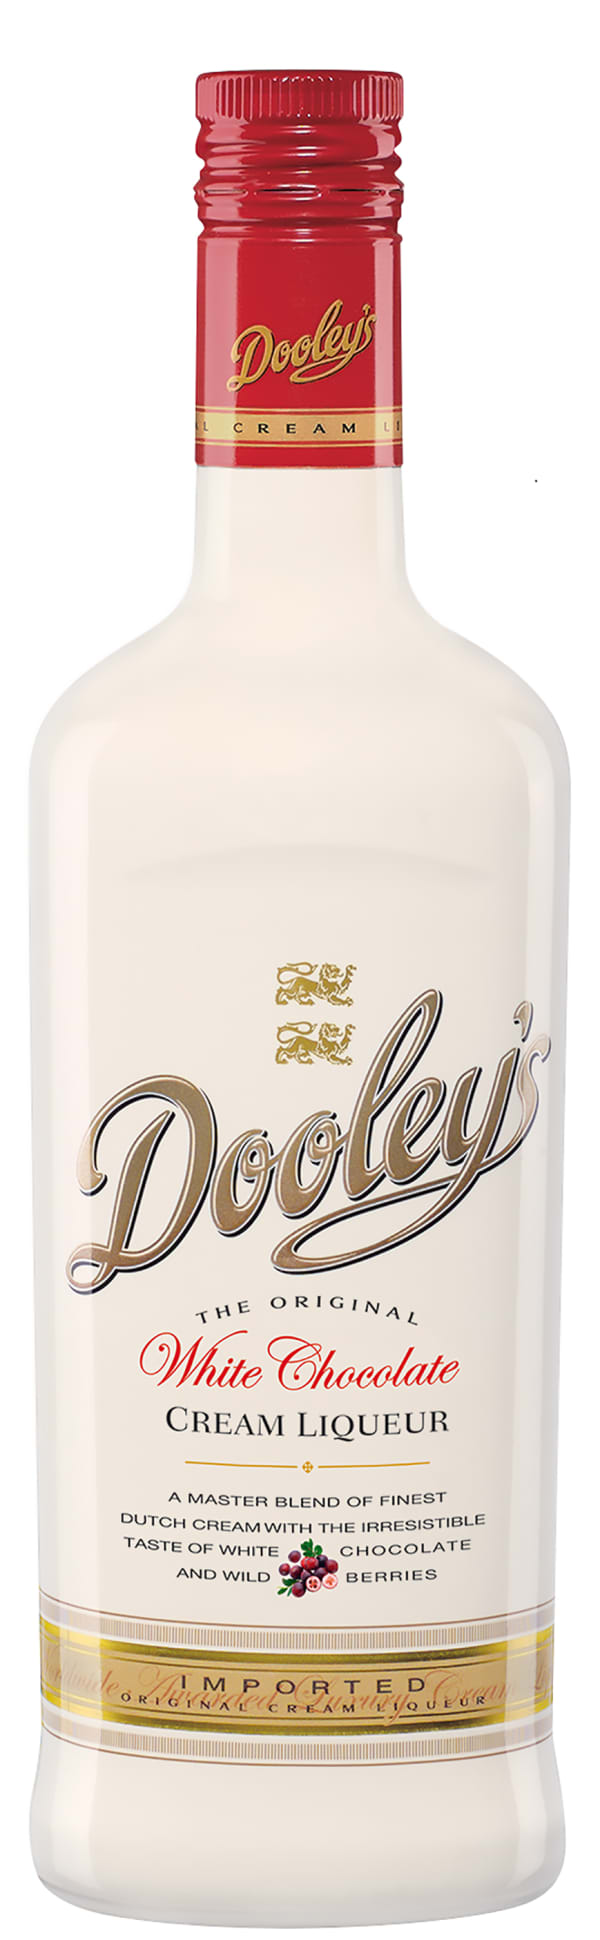 Dooley's White Chocolate Cream